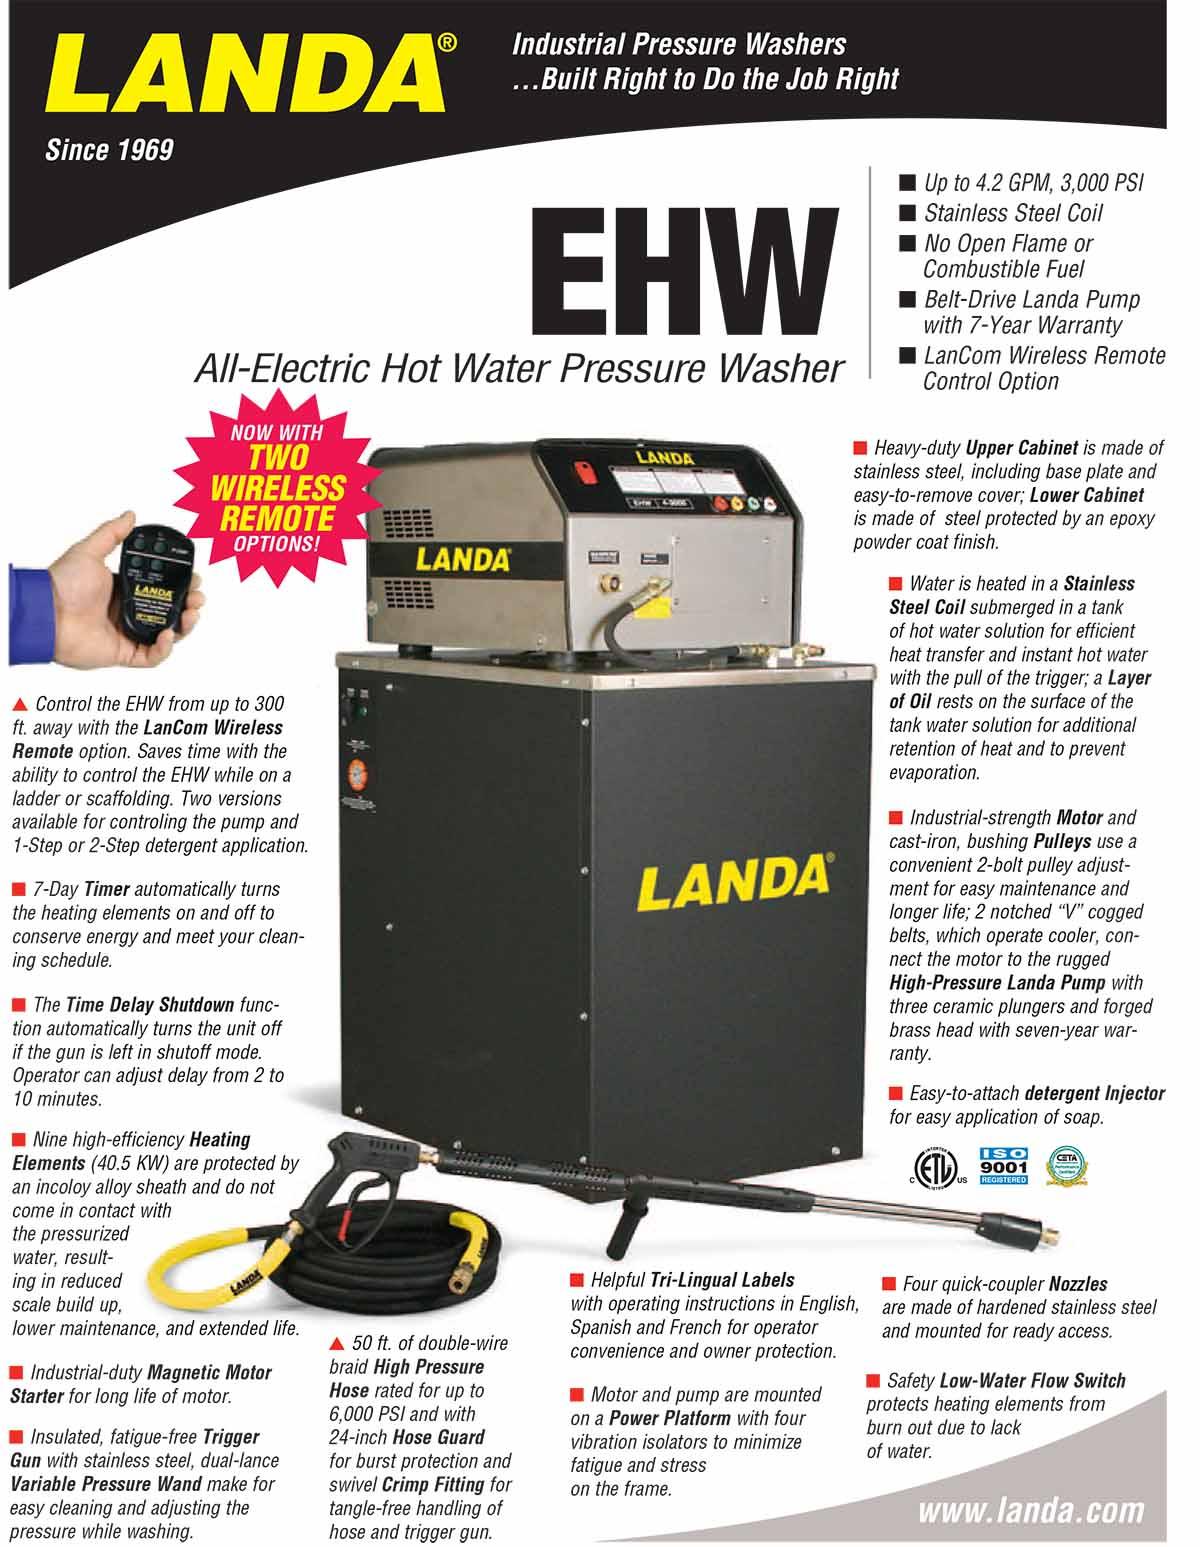 LANDA EHW Equipment Flyer